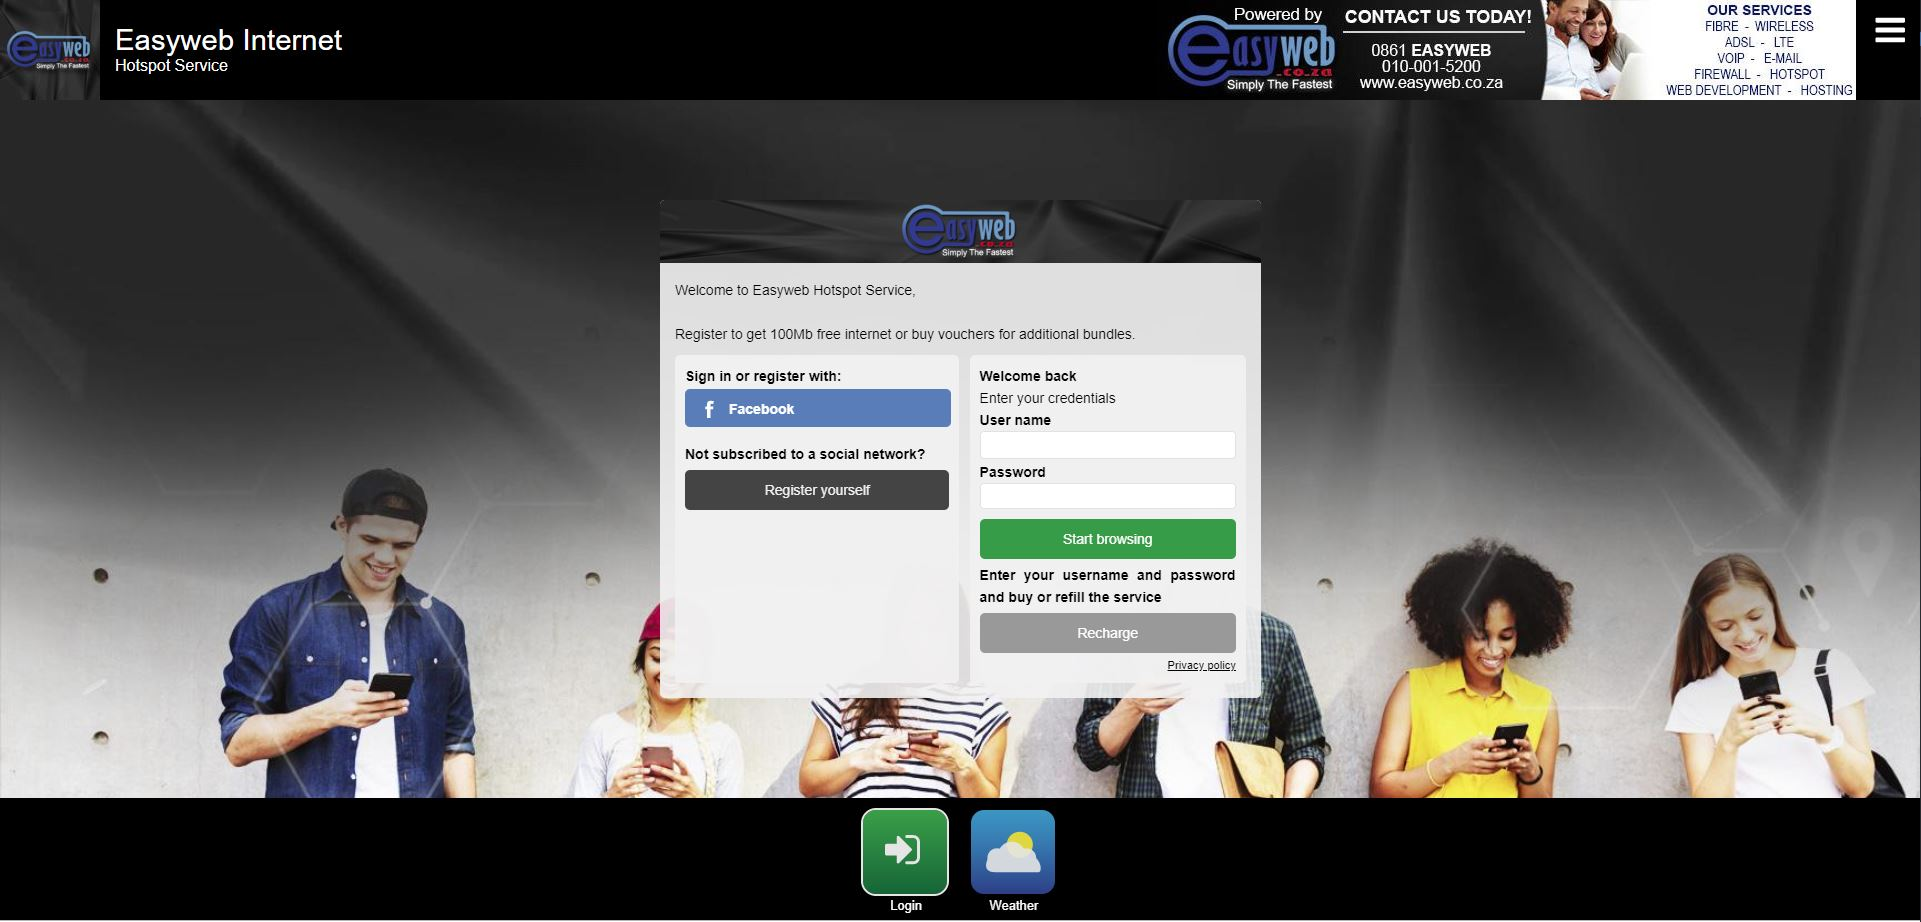 Easyweb Internet HOTSPOT